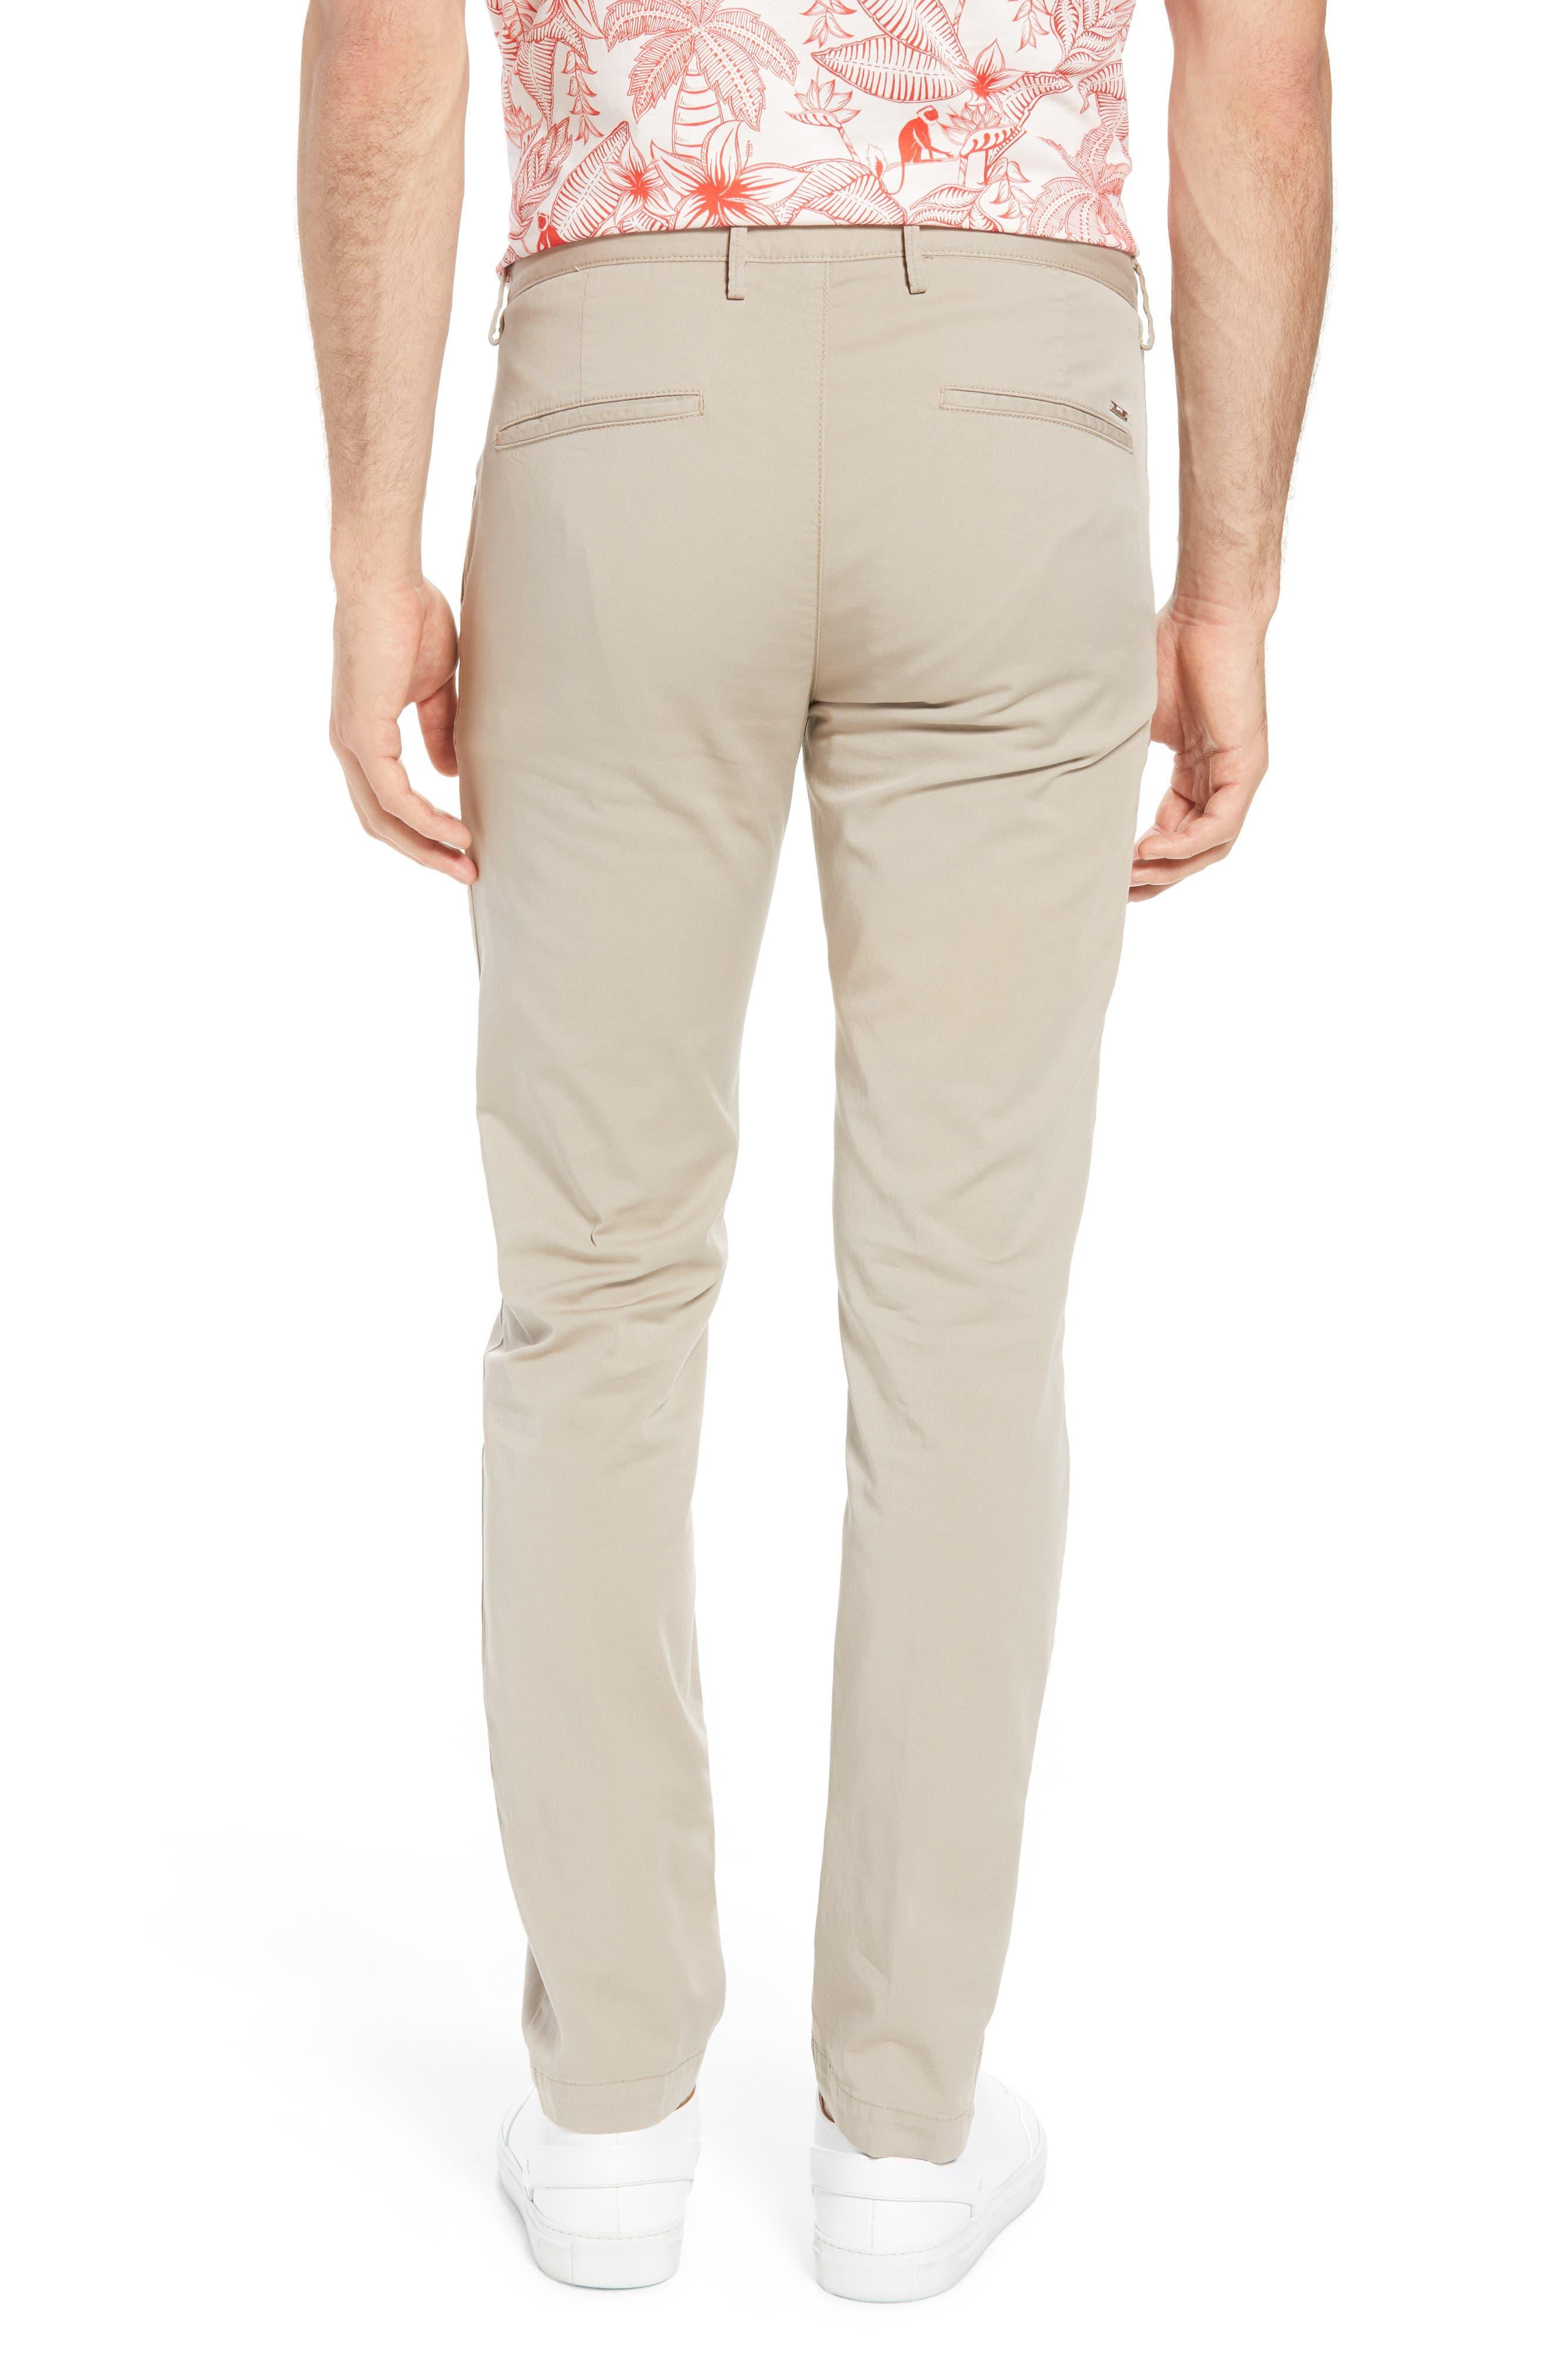 Rice Slim Fit Chino Pants,                             Alternate thumbnail 2, color,                             Brown